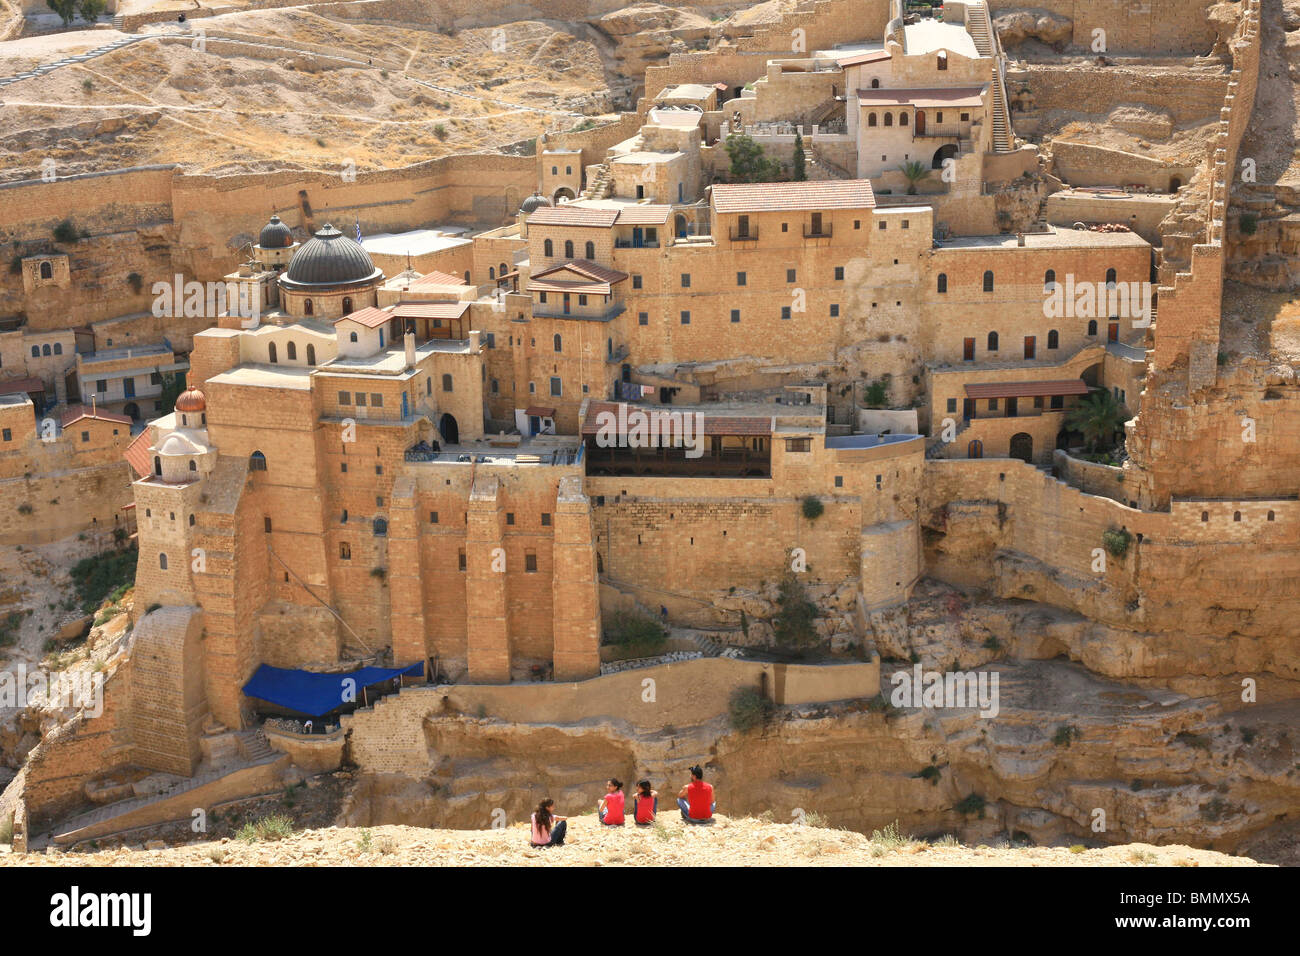 Israel, Judaea Desert, Wadi Kidron, The Great Lavra of St. Sabas (also Mar Saba) - Stock Image